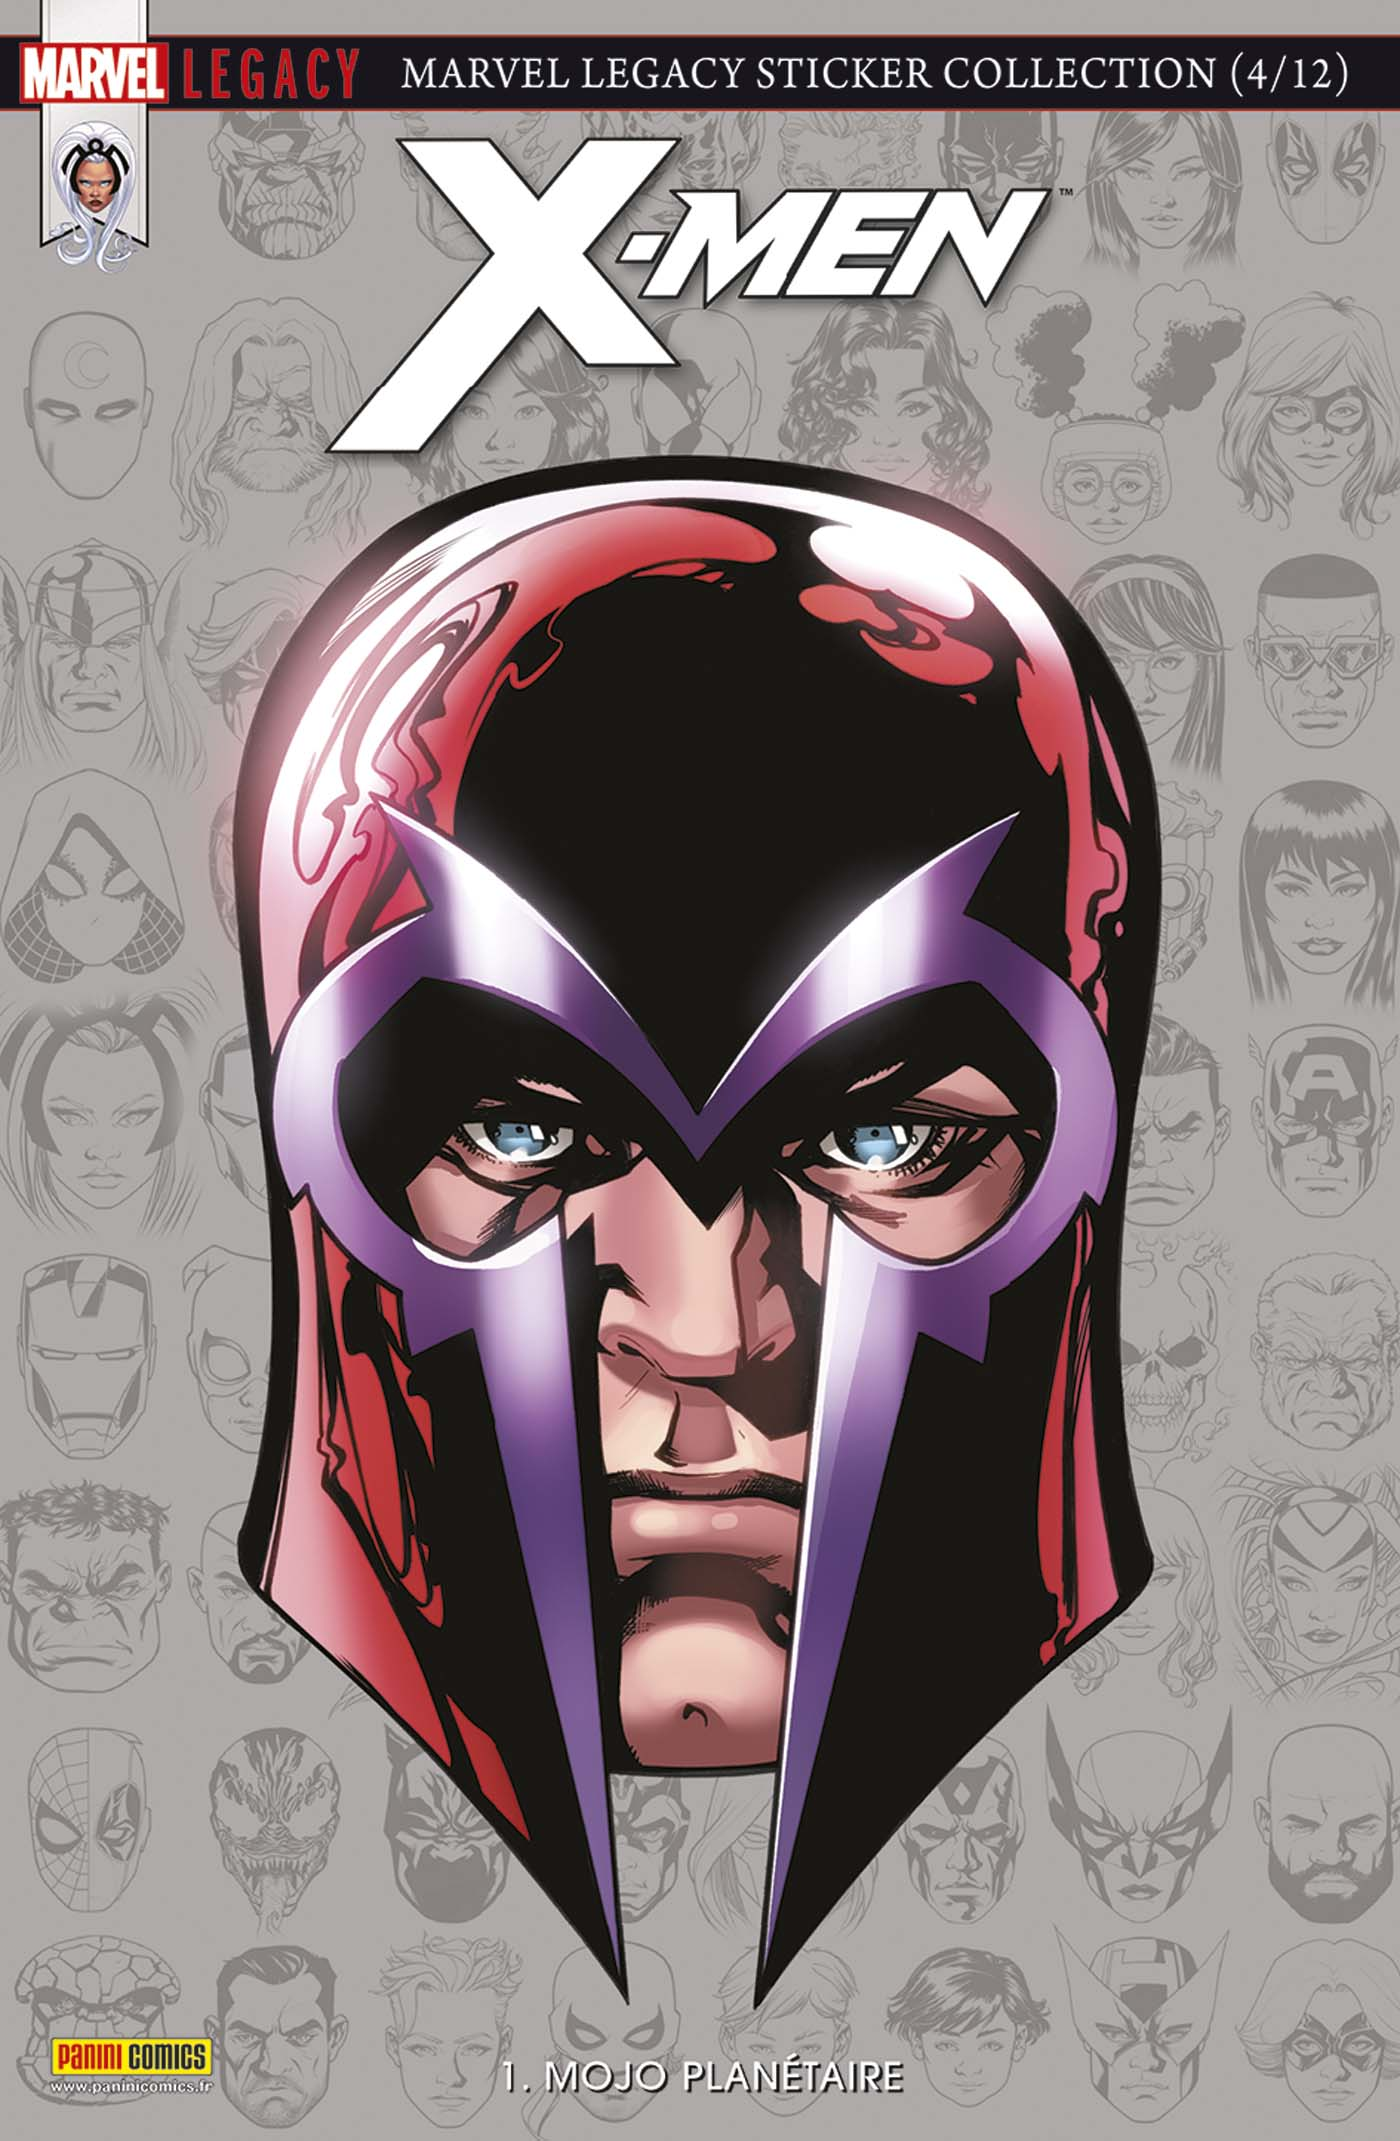 MARVEL LEGACY : X-MEN 1